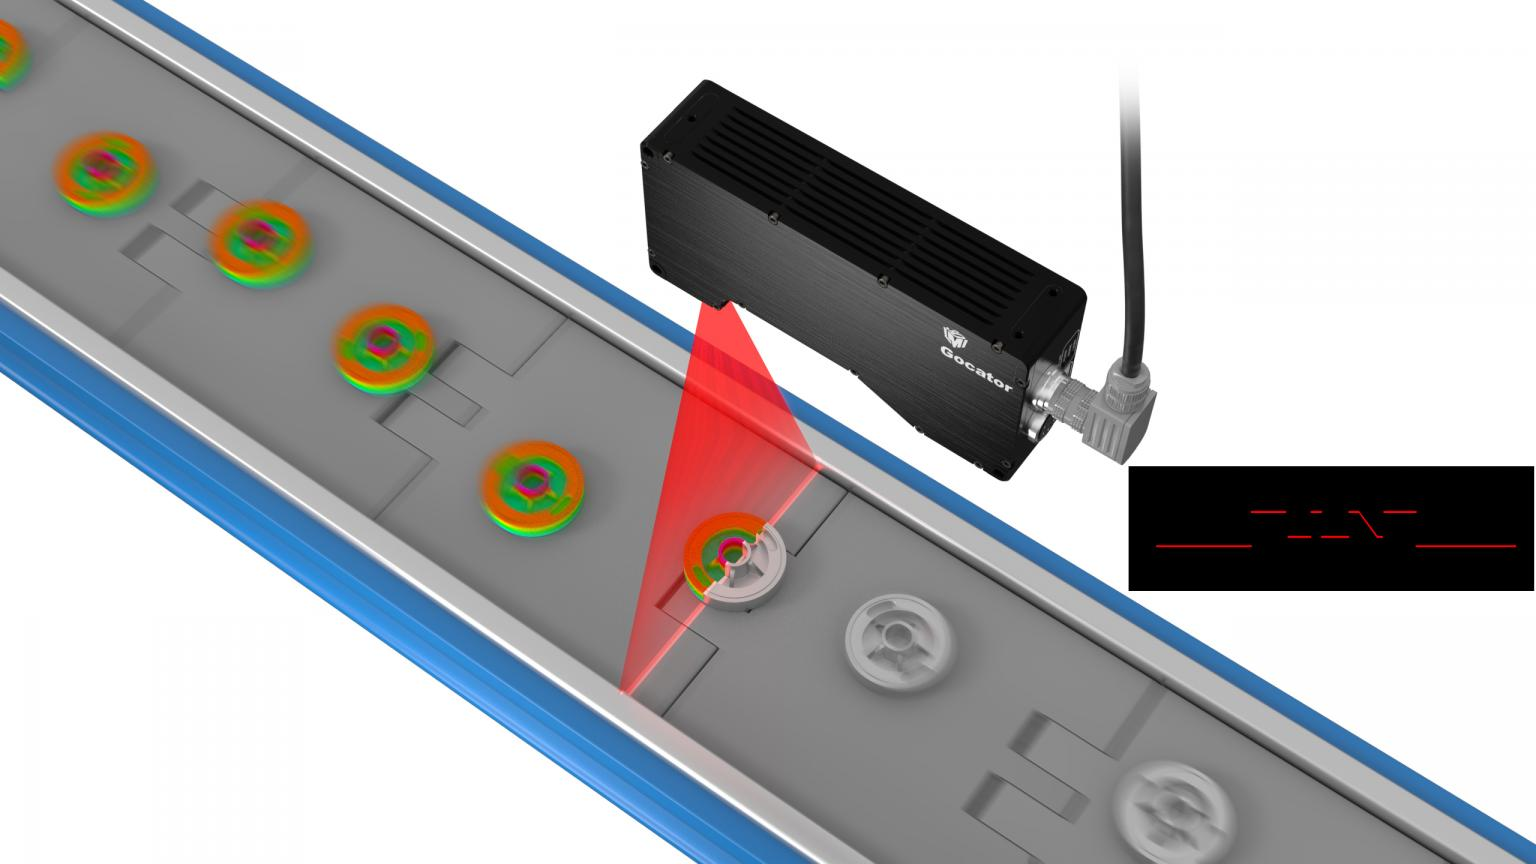 Highspeed Profiling isoR comp